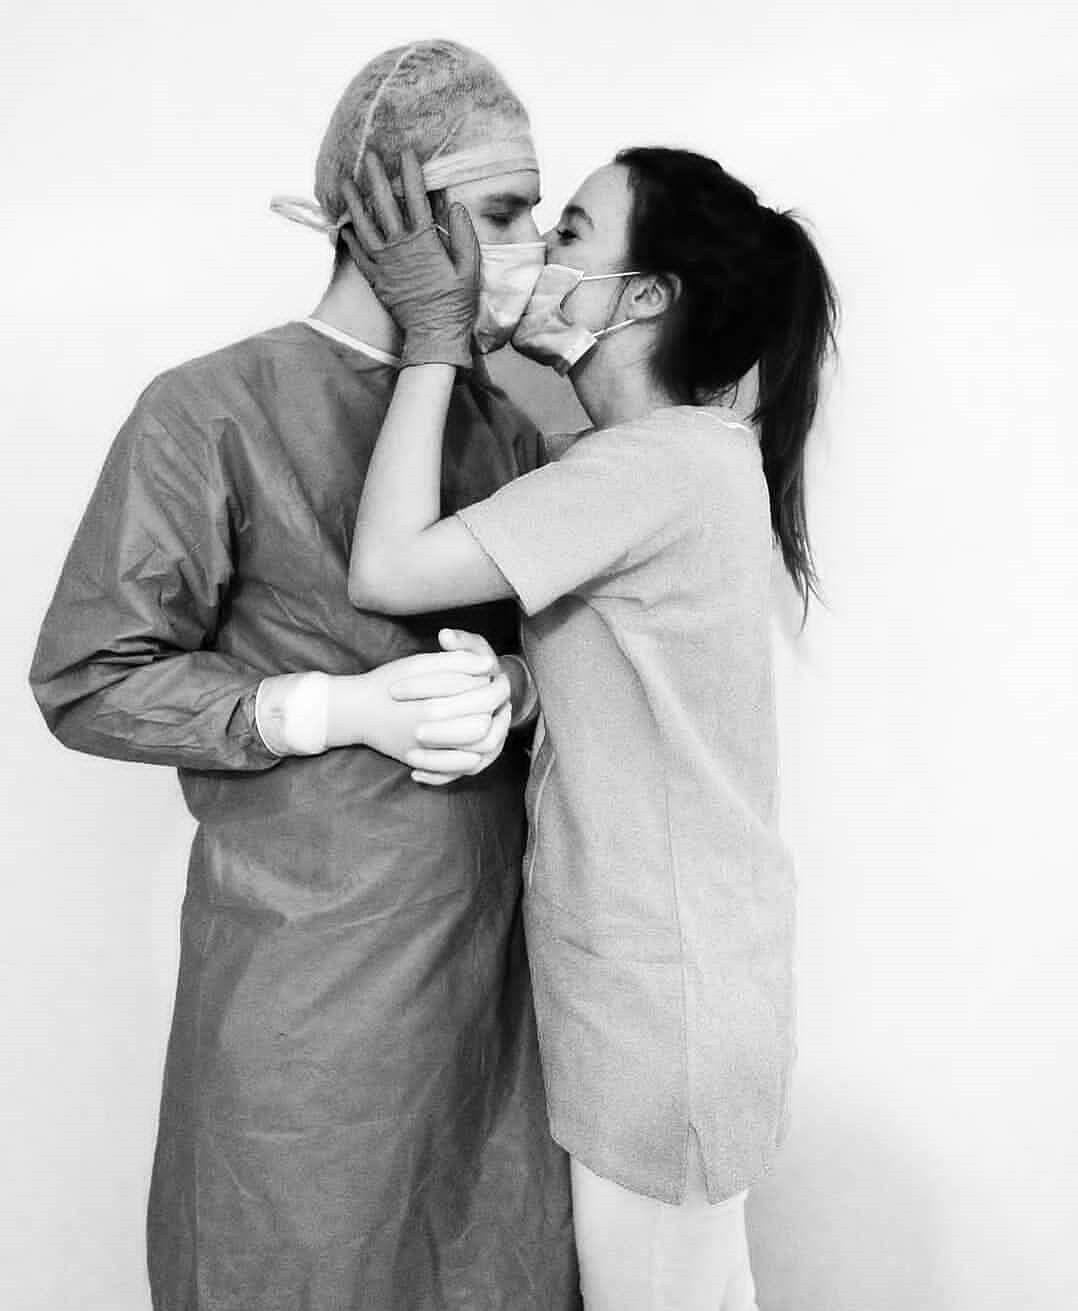 Krankenschwester Arzt Fake Krankenhaus Beste Krankenschwester